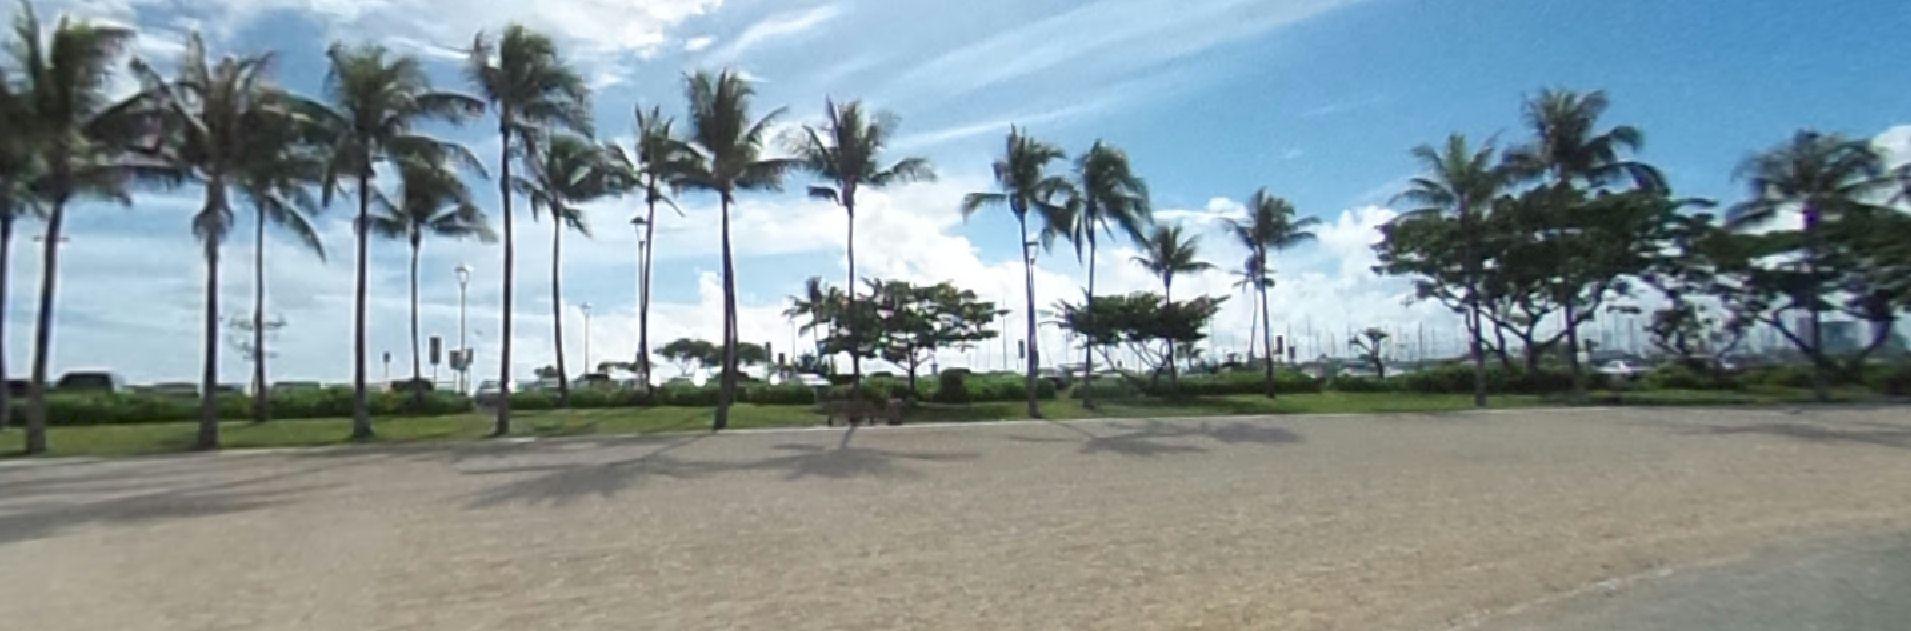 Hilton Hawaiian Village on Oahu